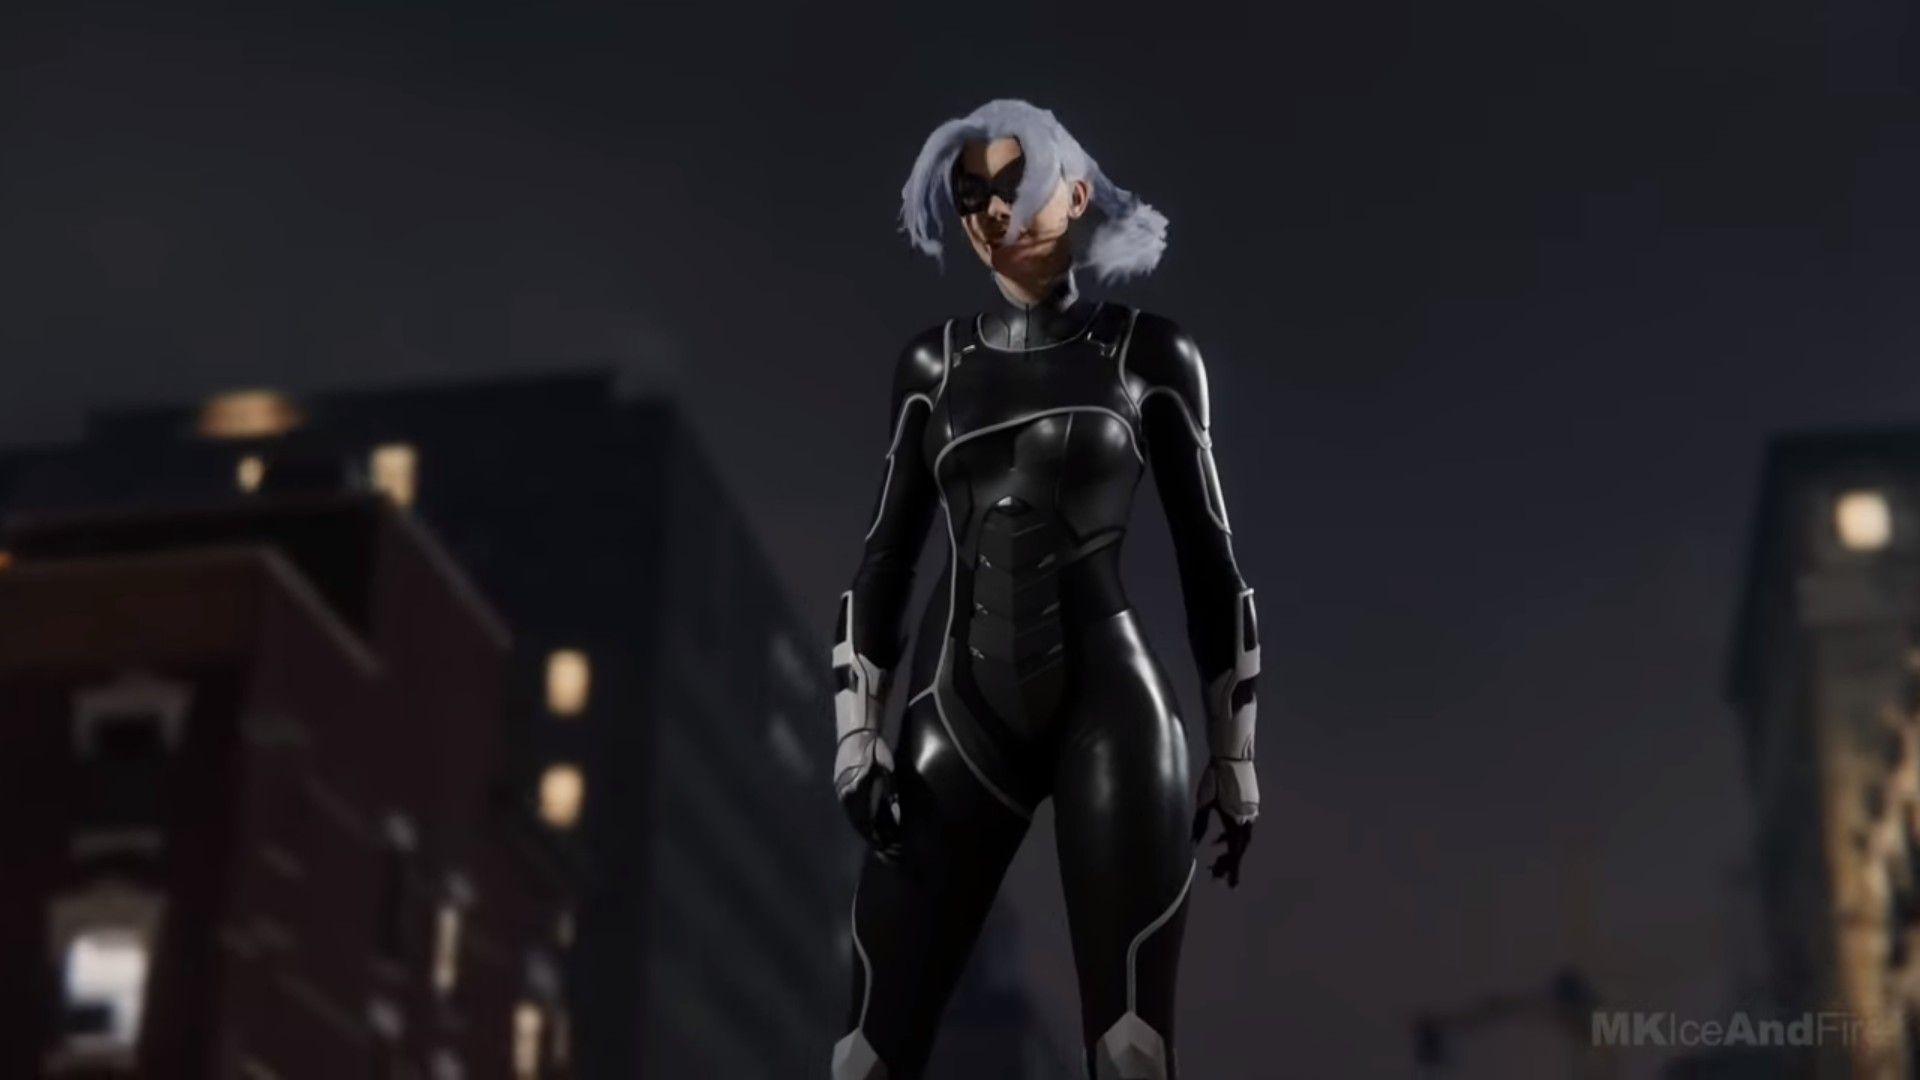 Black Cat From Marvel Spiderman Ps4 Black Cat Marvel Black Cat Marvel Spiderman